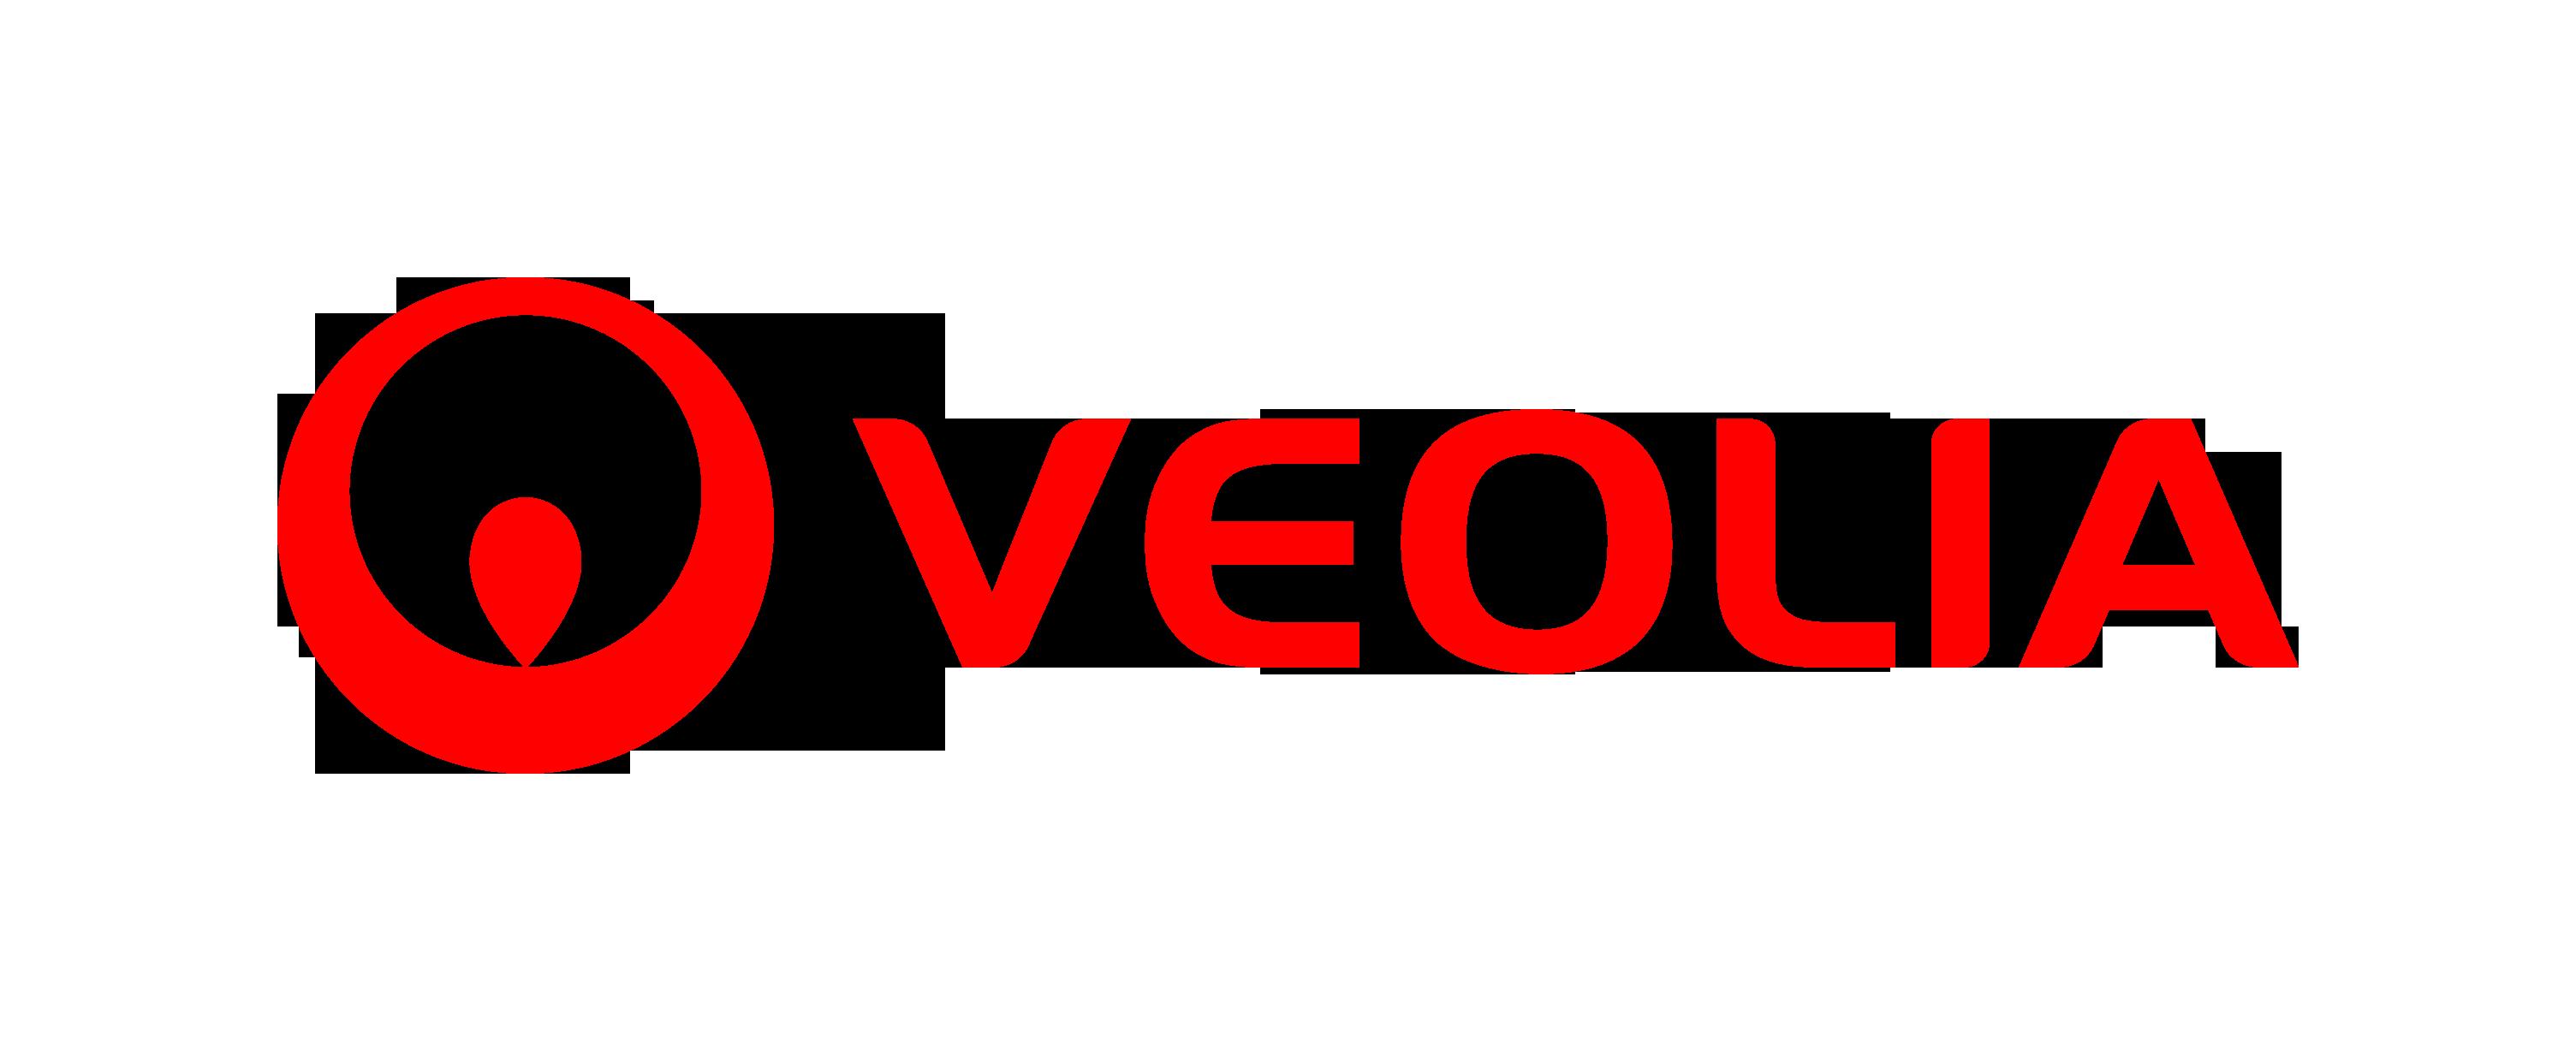 RGB VEOLIA HD 2014